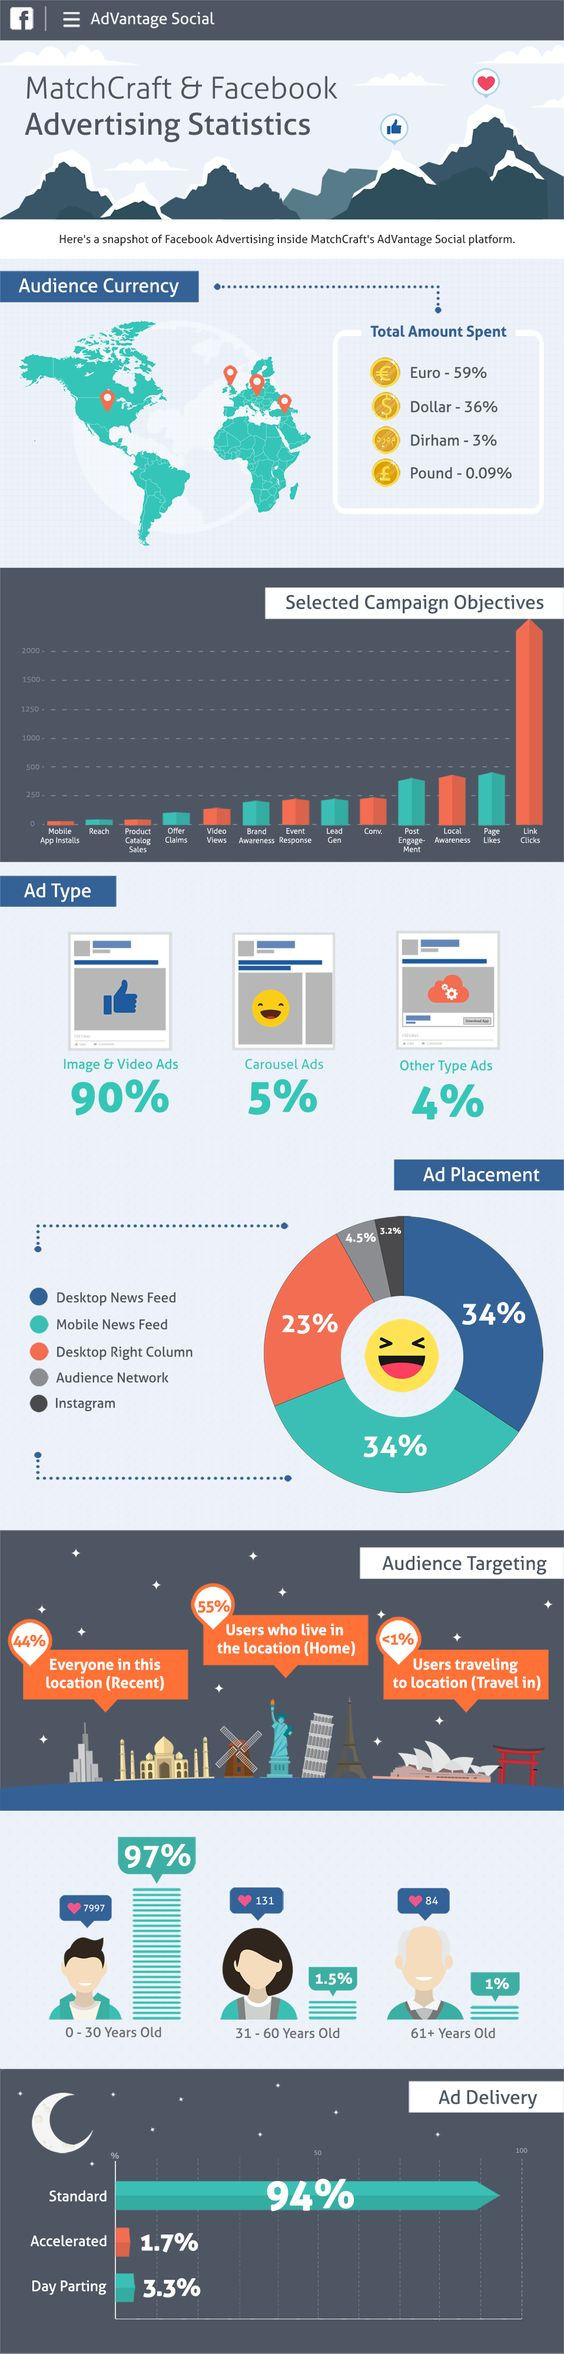 Facebook ads statistics infographic matchcraft